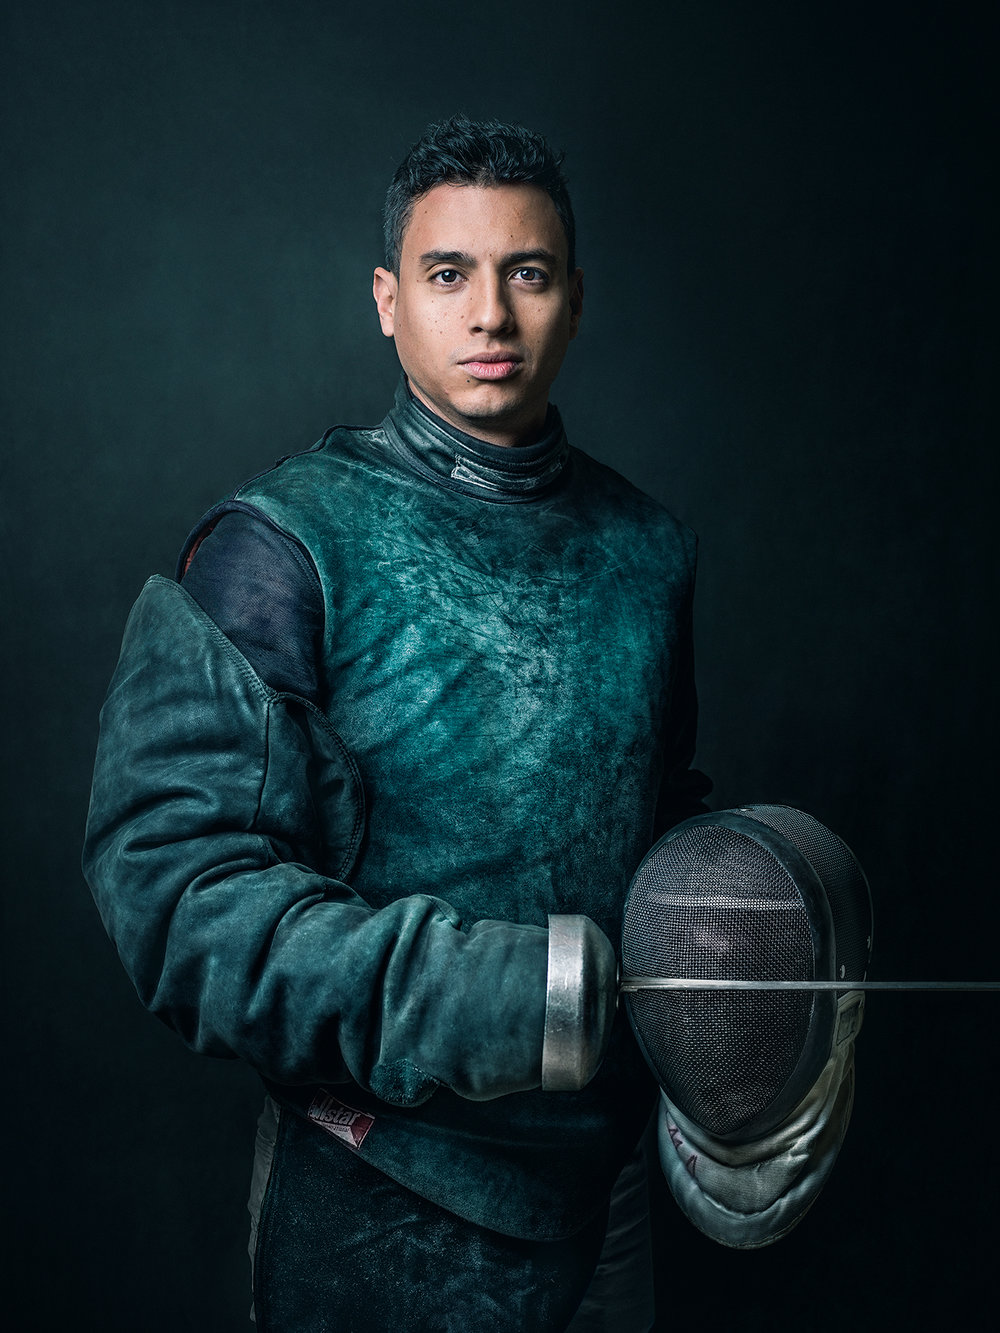 Oscar-arribas-esgrima-maestro-fencing-master-fencer-fechten-scherma-escrime-portrait-fotografo-retrato-photographer021.jpg